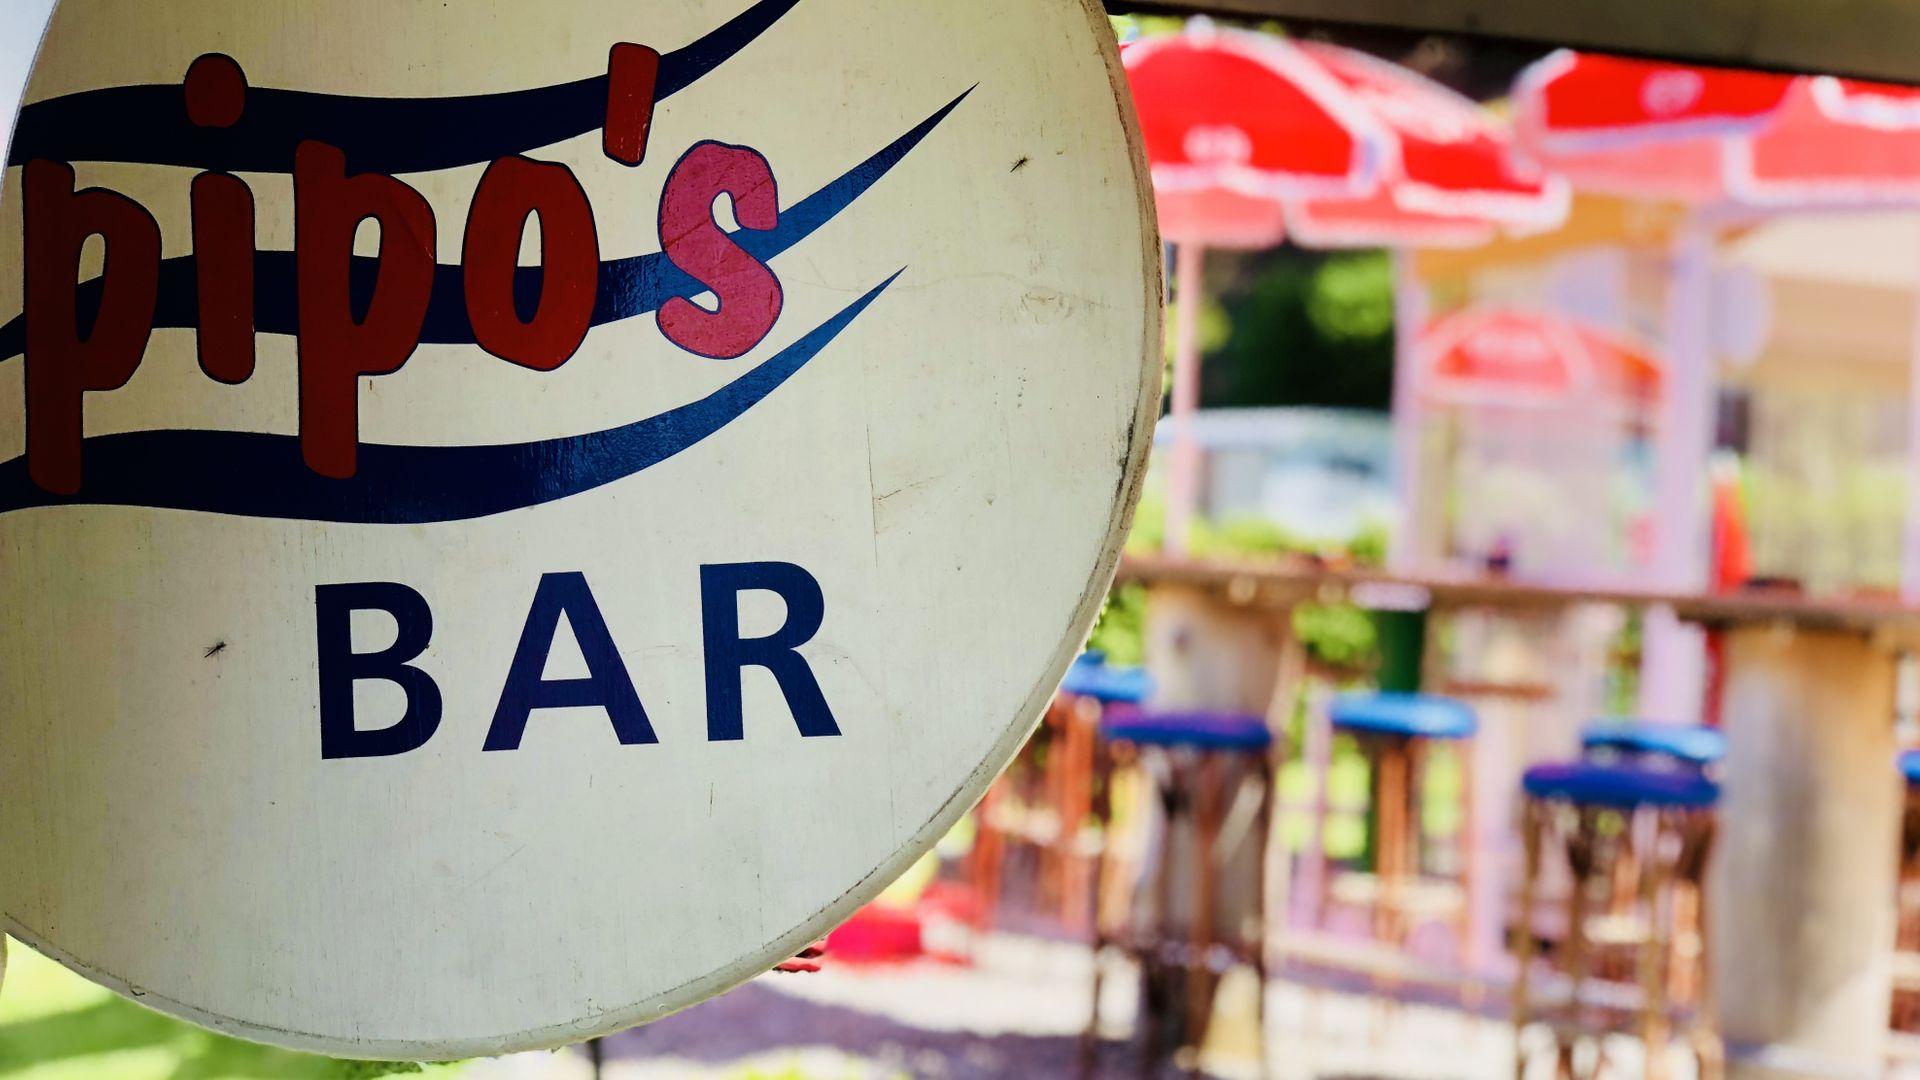 Speisen & Trinken in pipo`s BAR | pipo's BAR